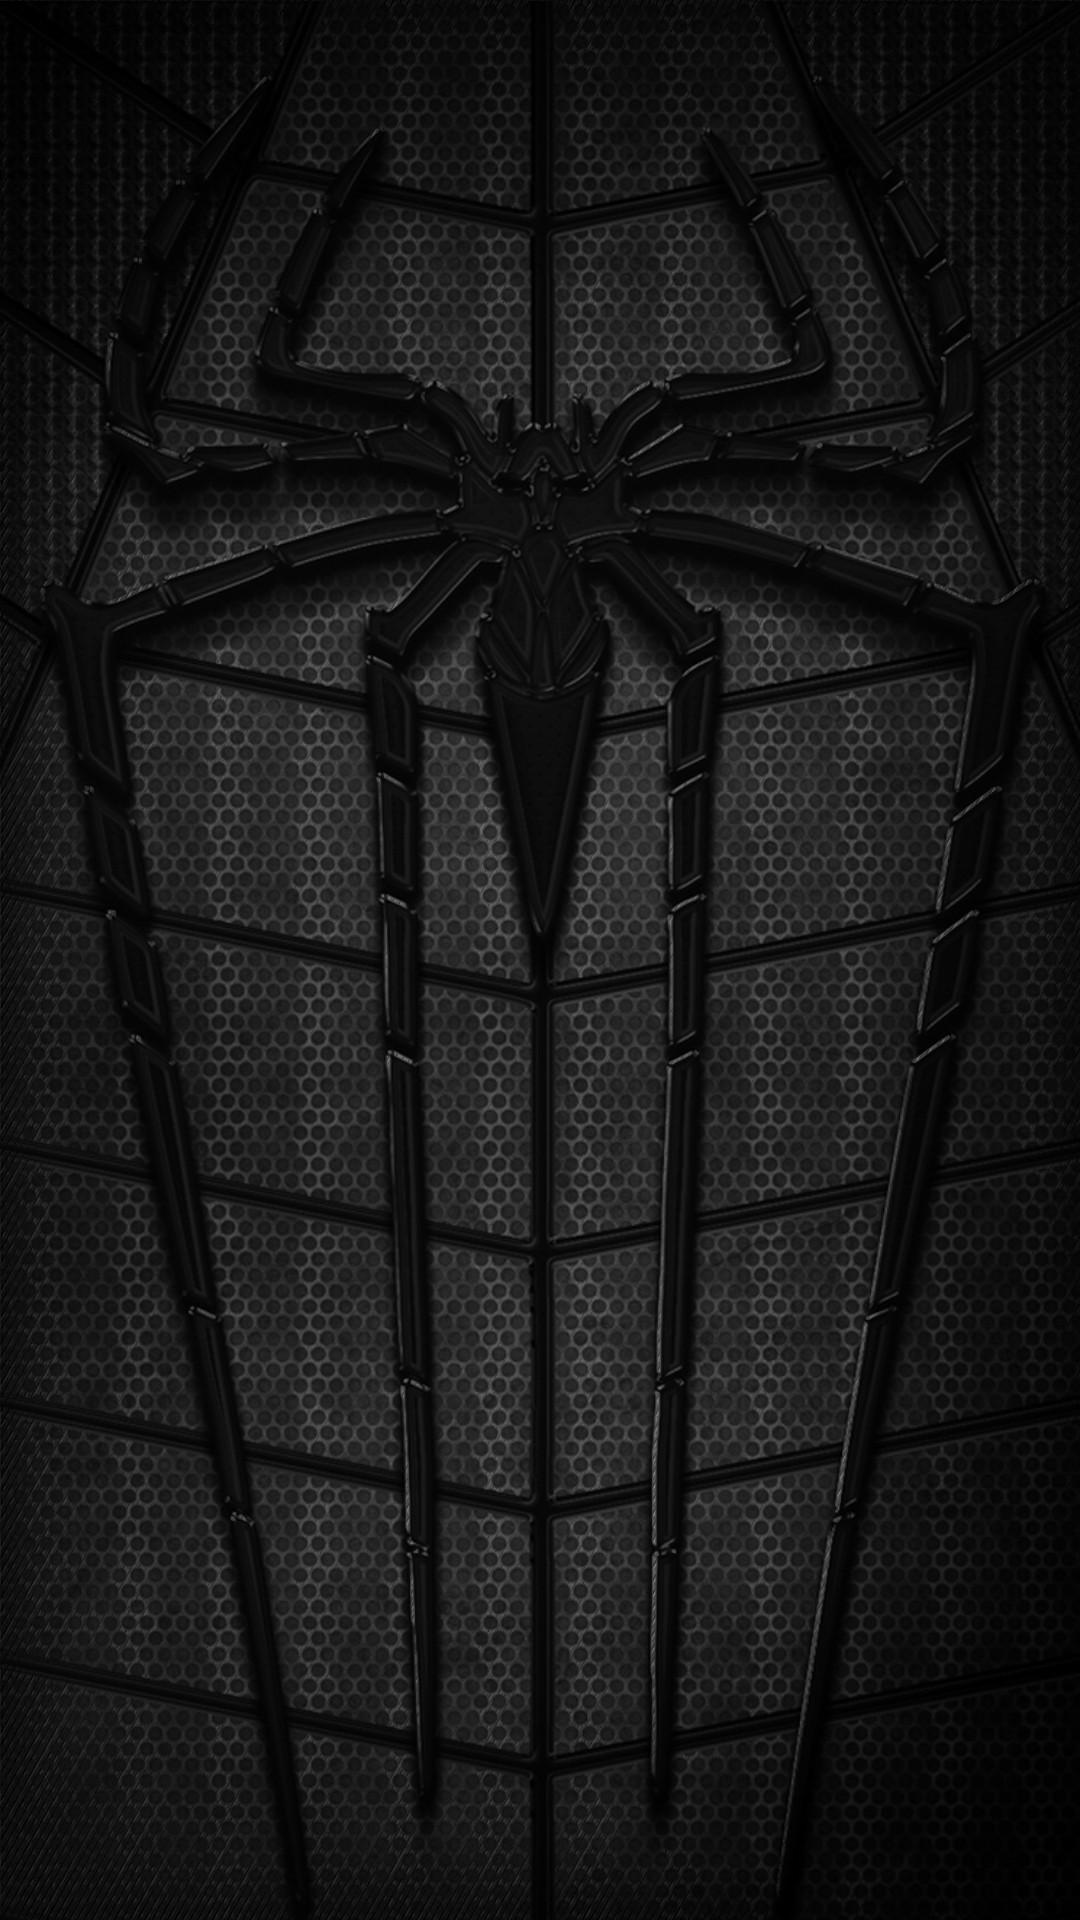 Black Spider Man Wallpapers